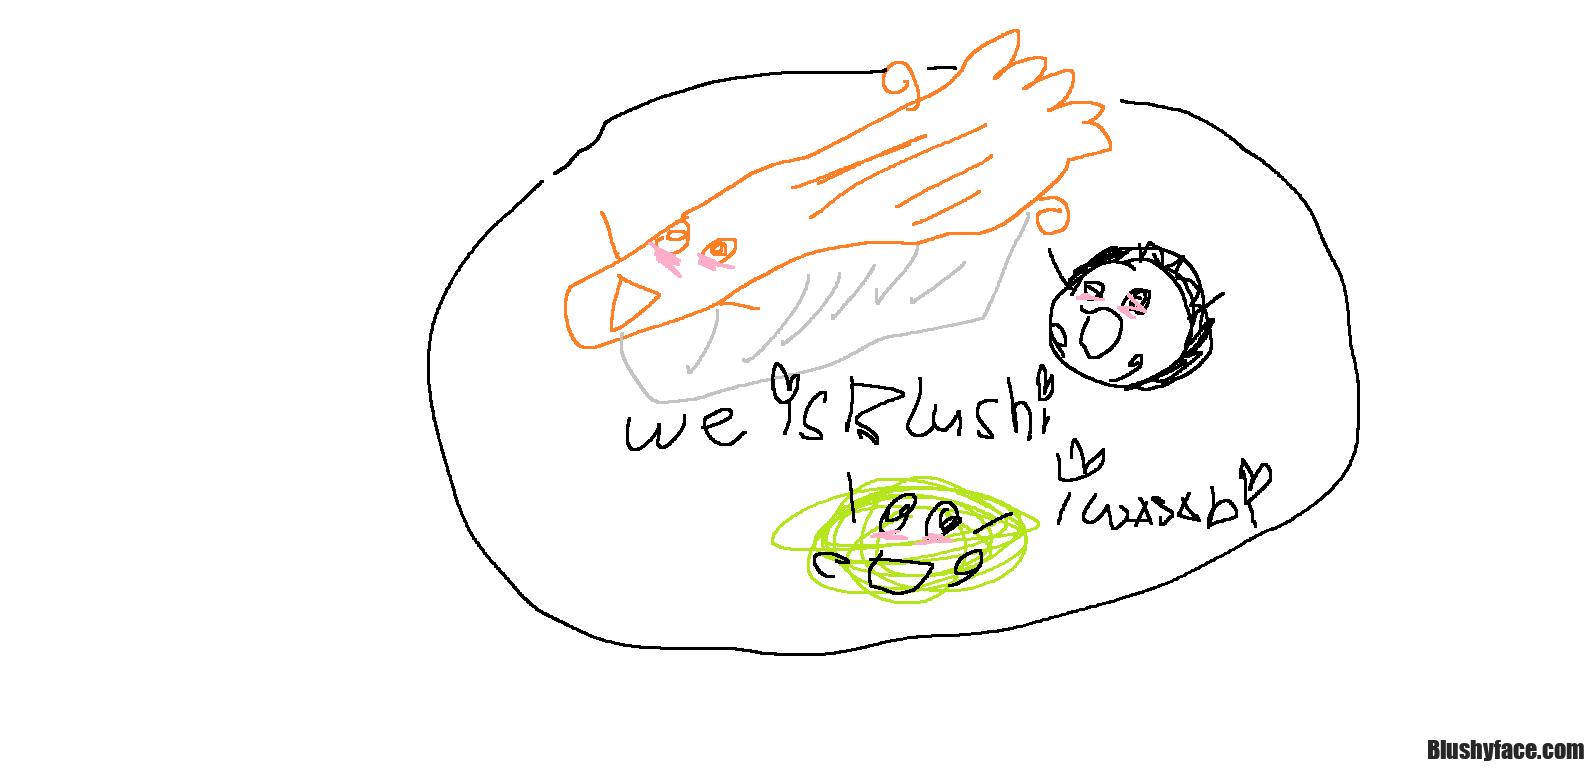 We is yummies